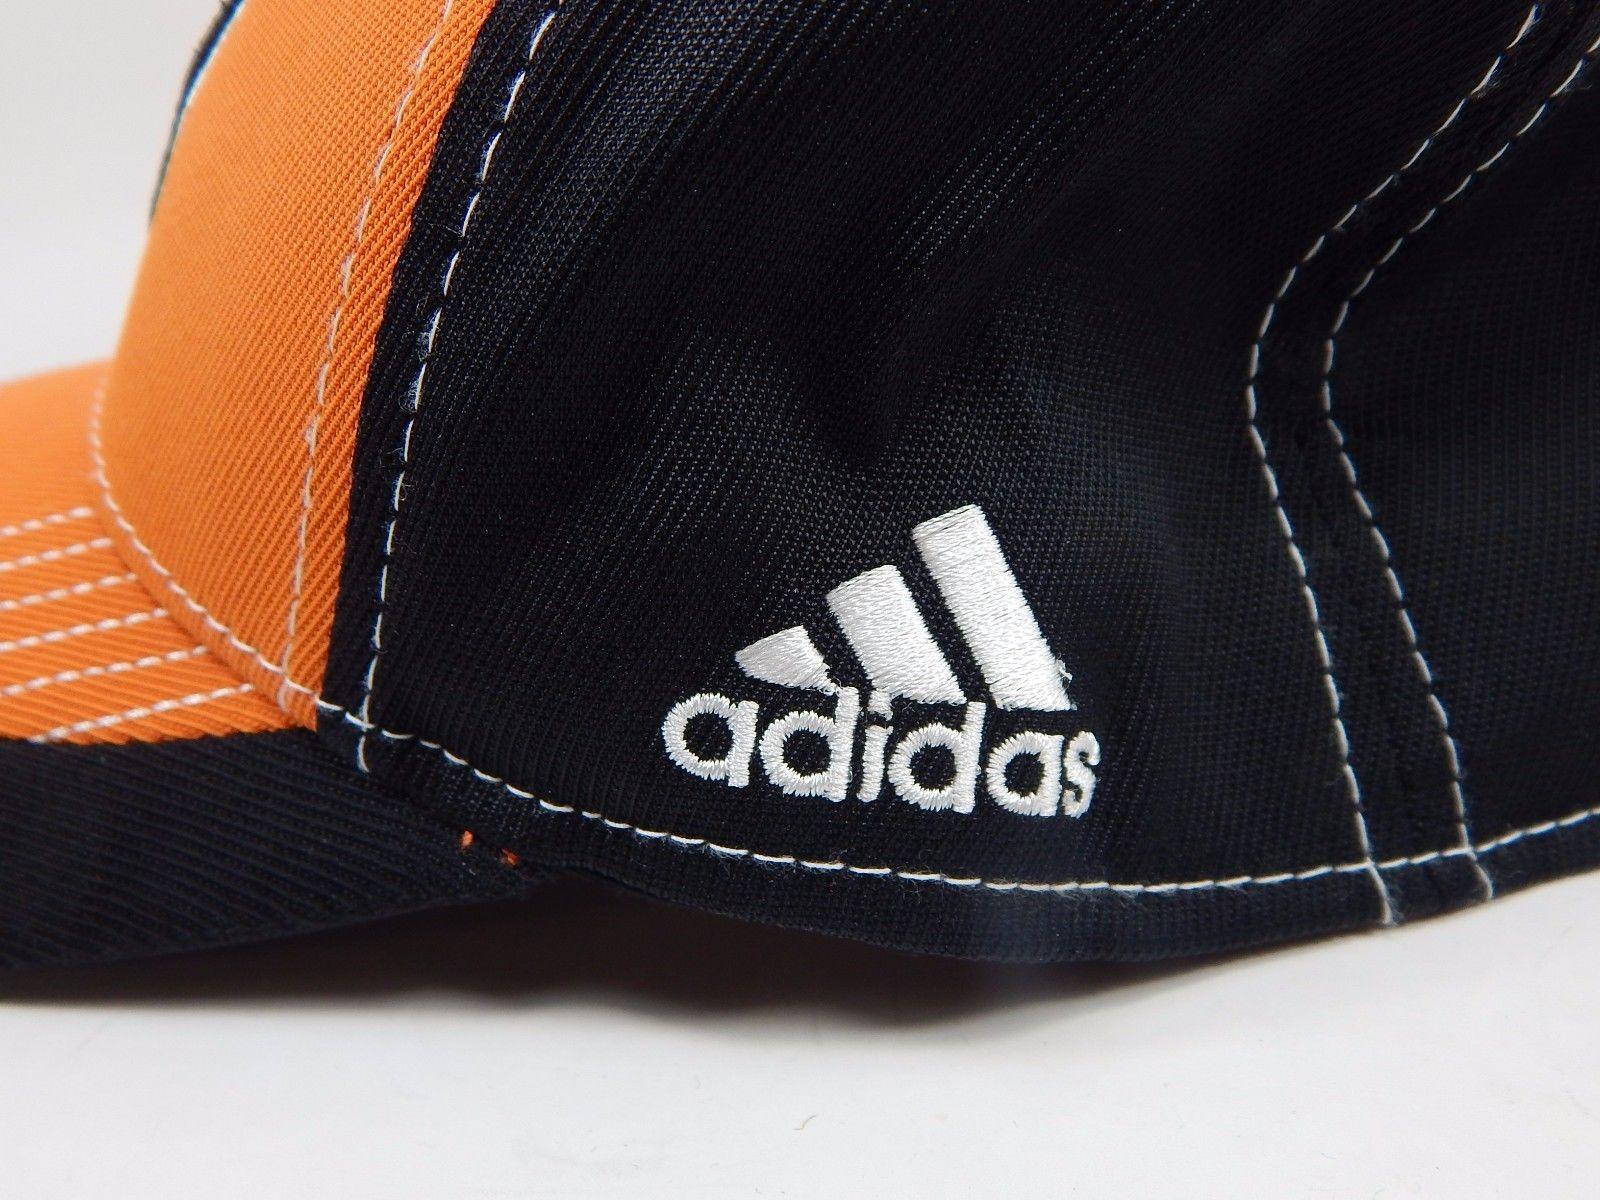 Phoenix Suns NBA Dribble Series Adidas Official Snap Back Curve Brim Cap Hat